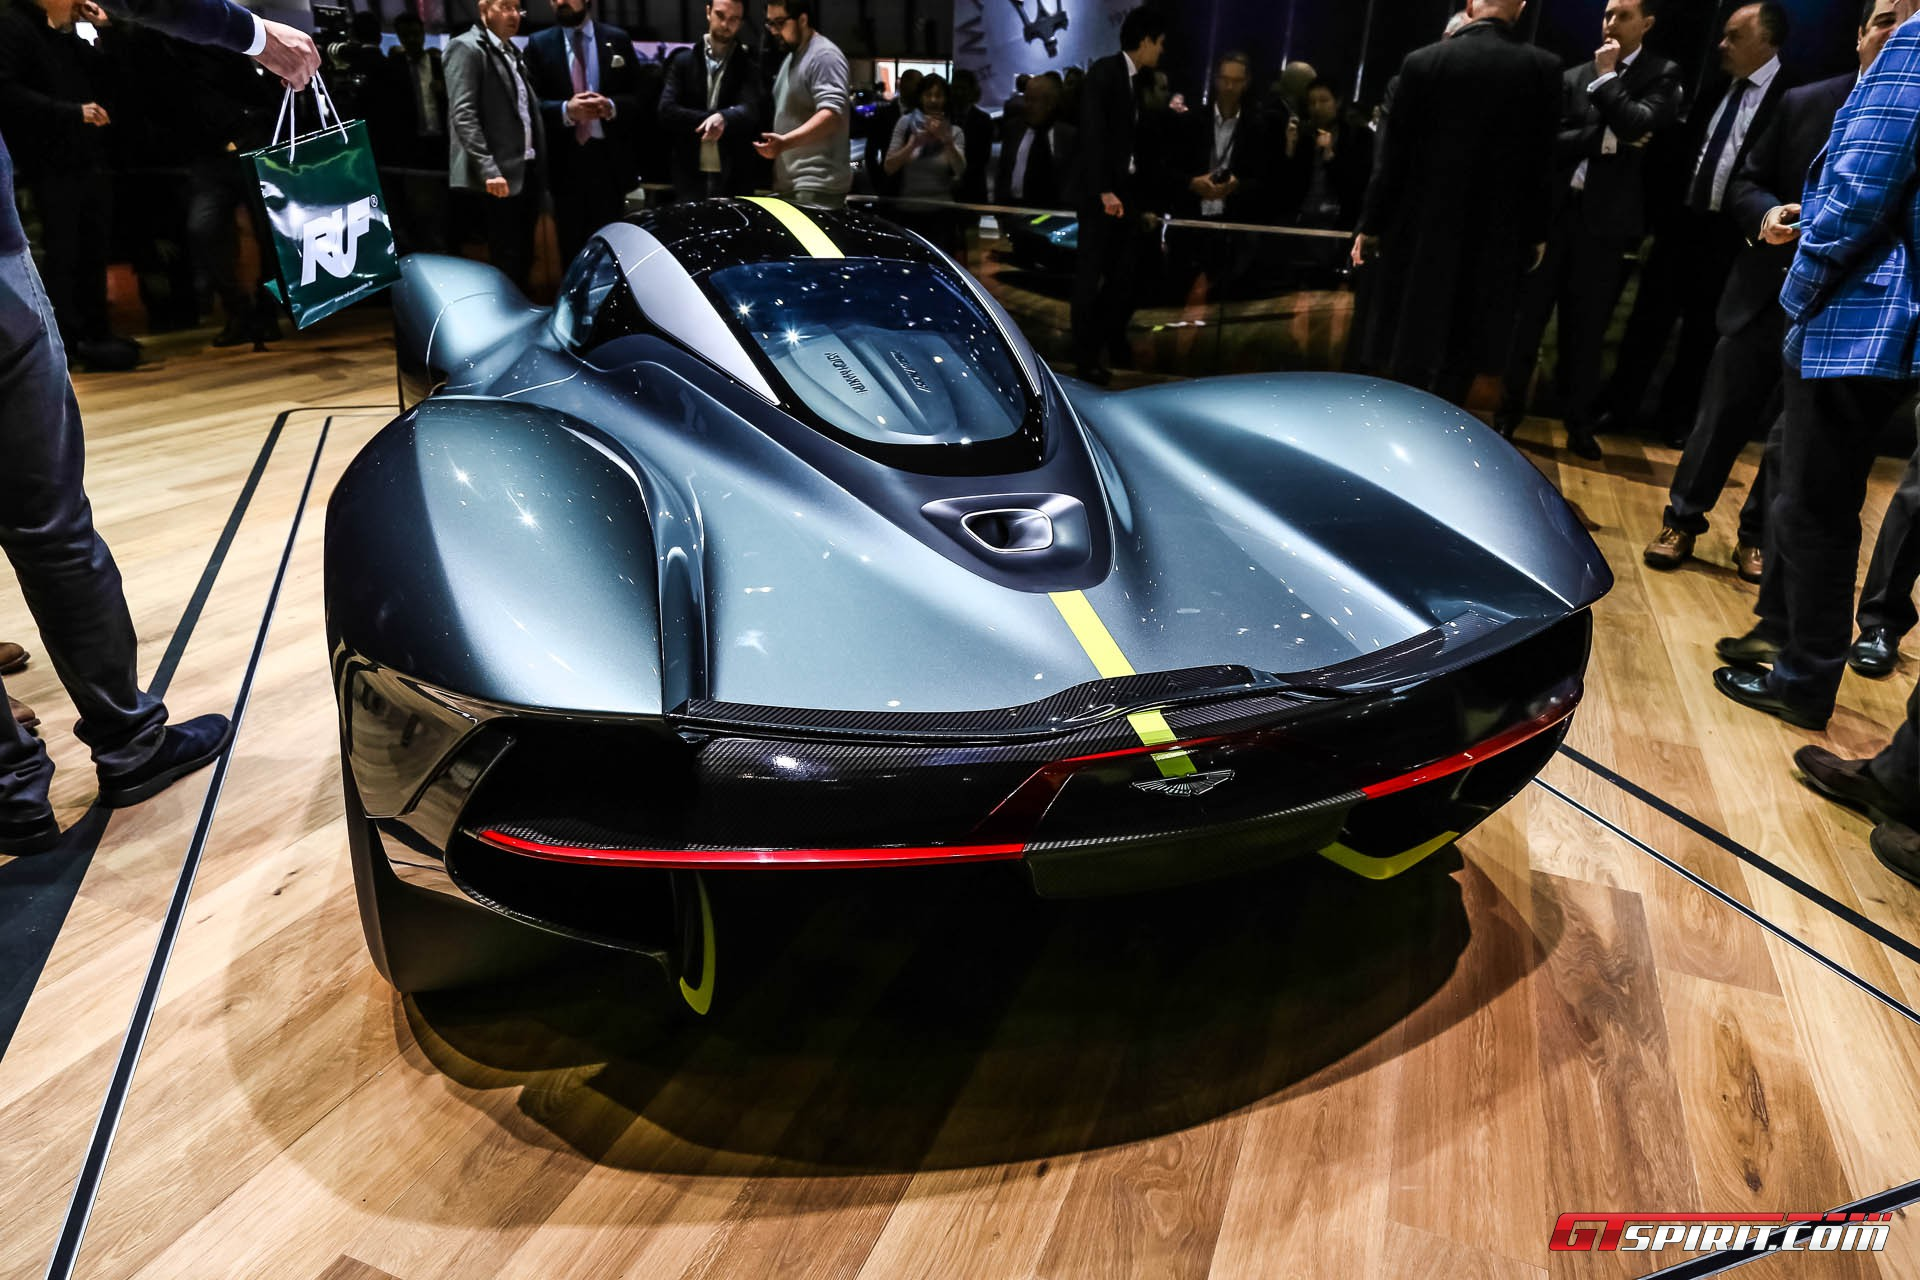 Geneva 2017: Aston Martin Valkyrie AM-RB 001 Hypercar